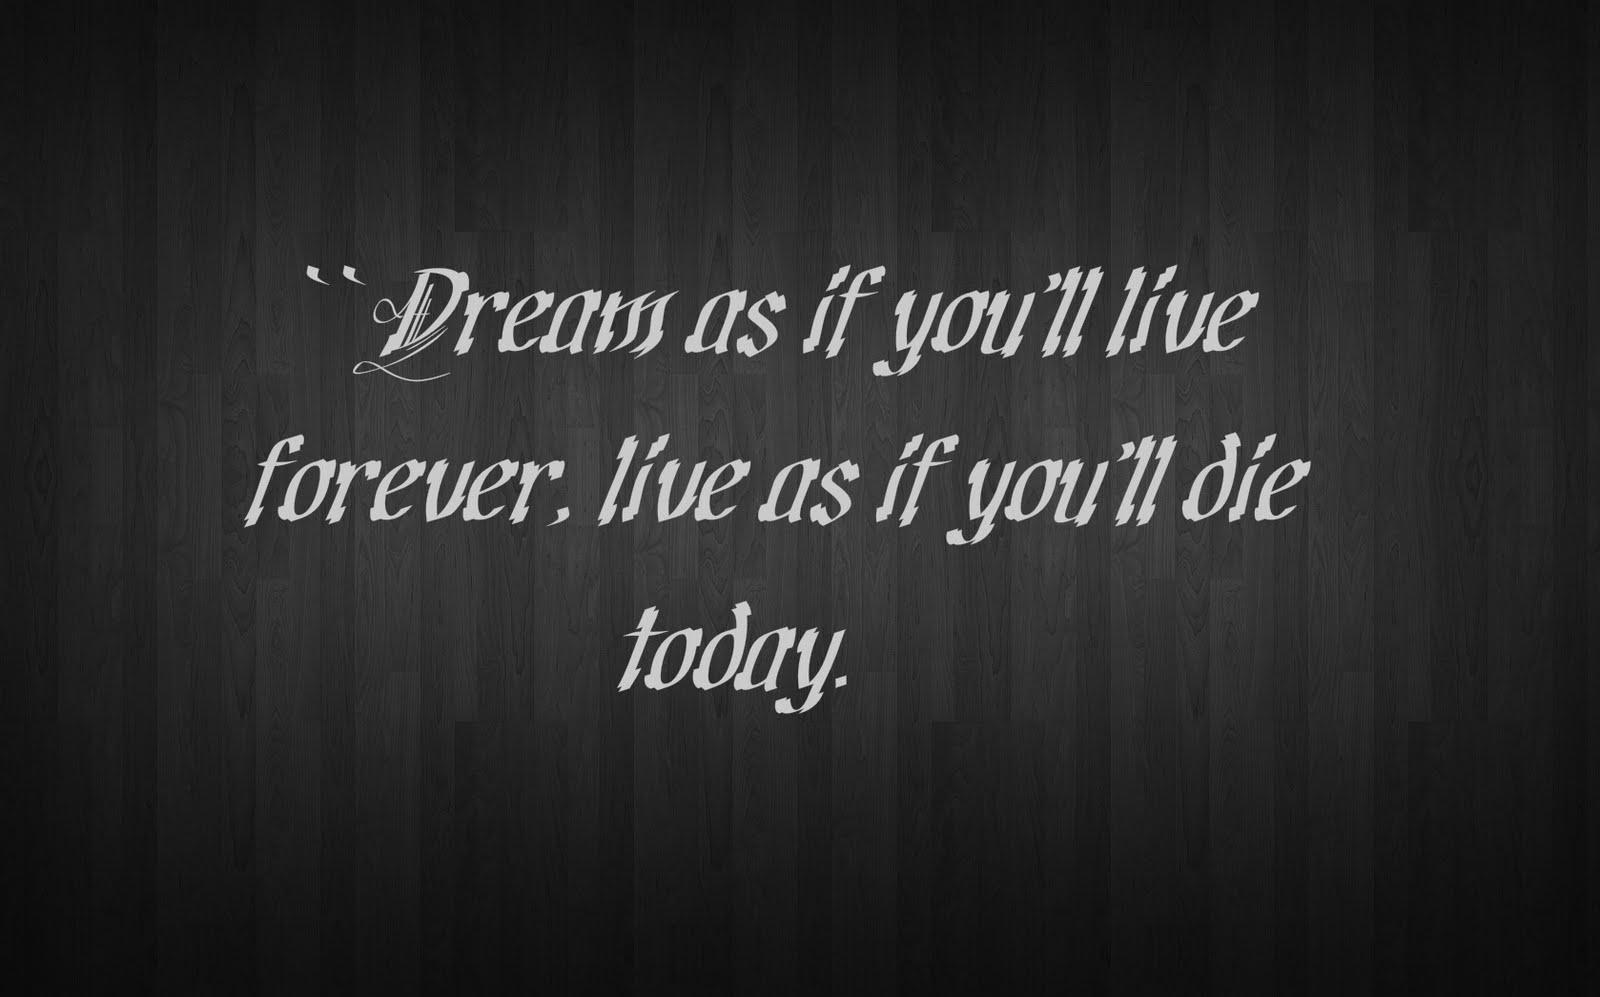 http://2.bp.blogspot.com/-lKpE2TCgXs0/Tke9LowpEnI/AAAAAAAABk0/Fm2nbfc29p8/s1600/Dream.jpg